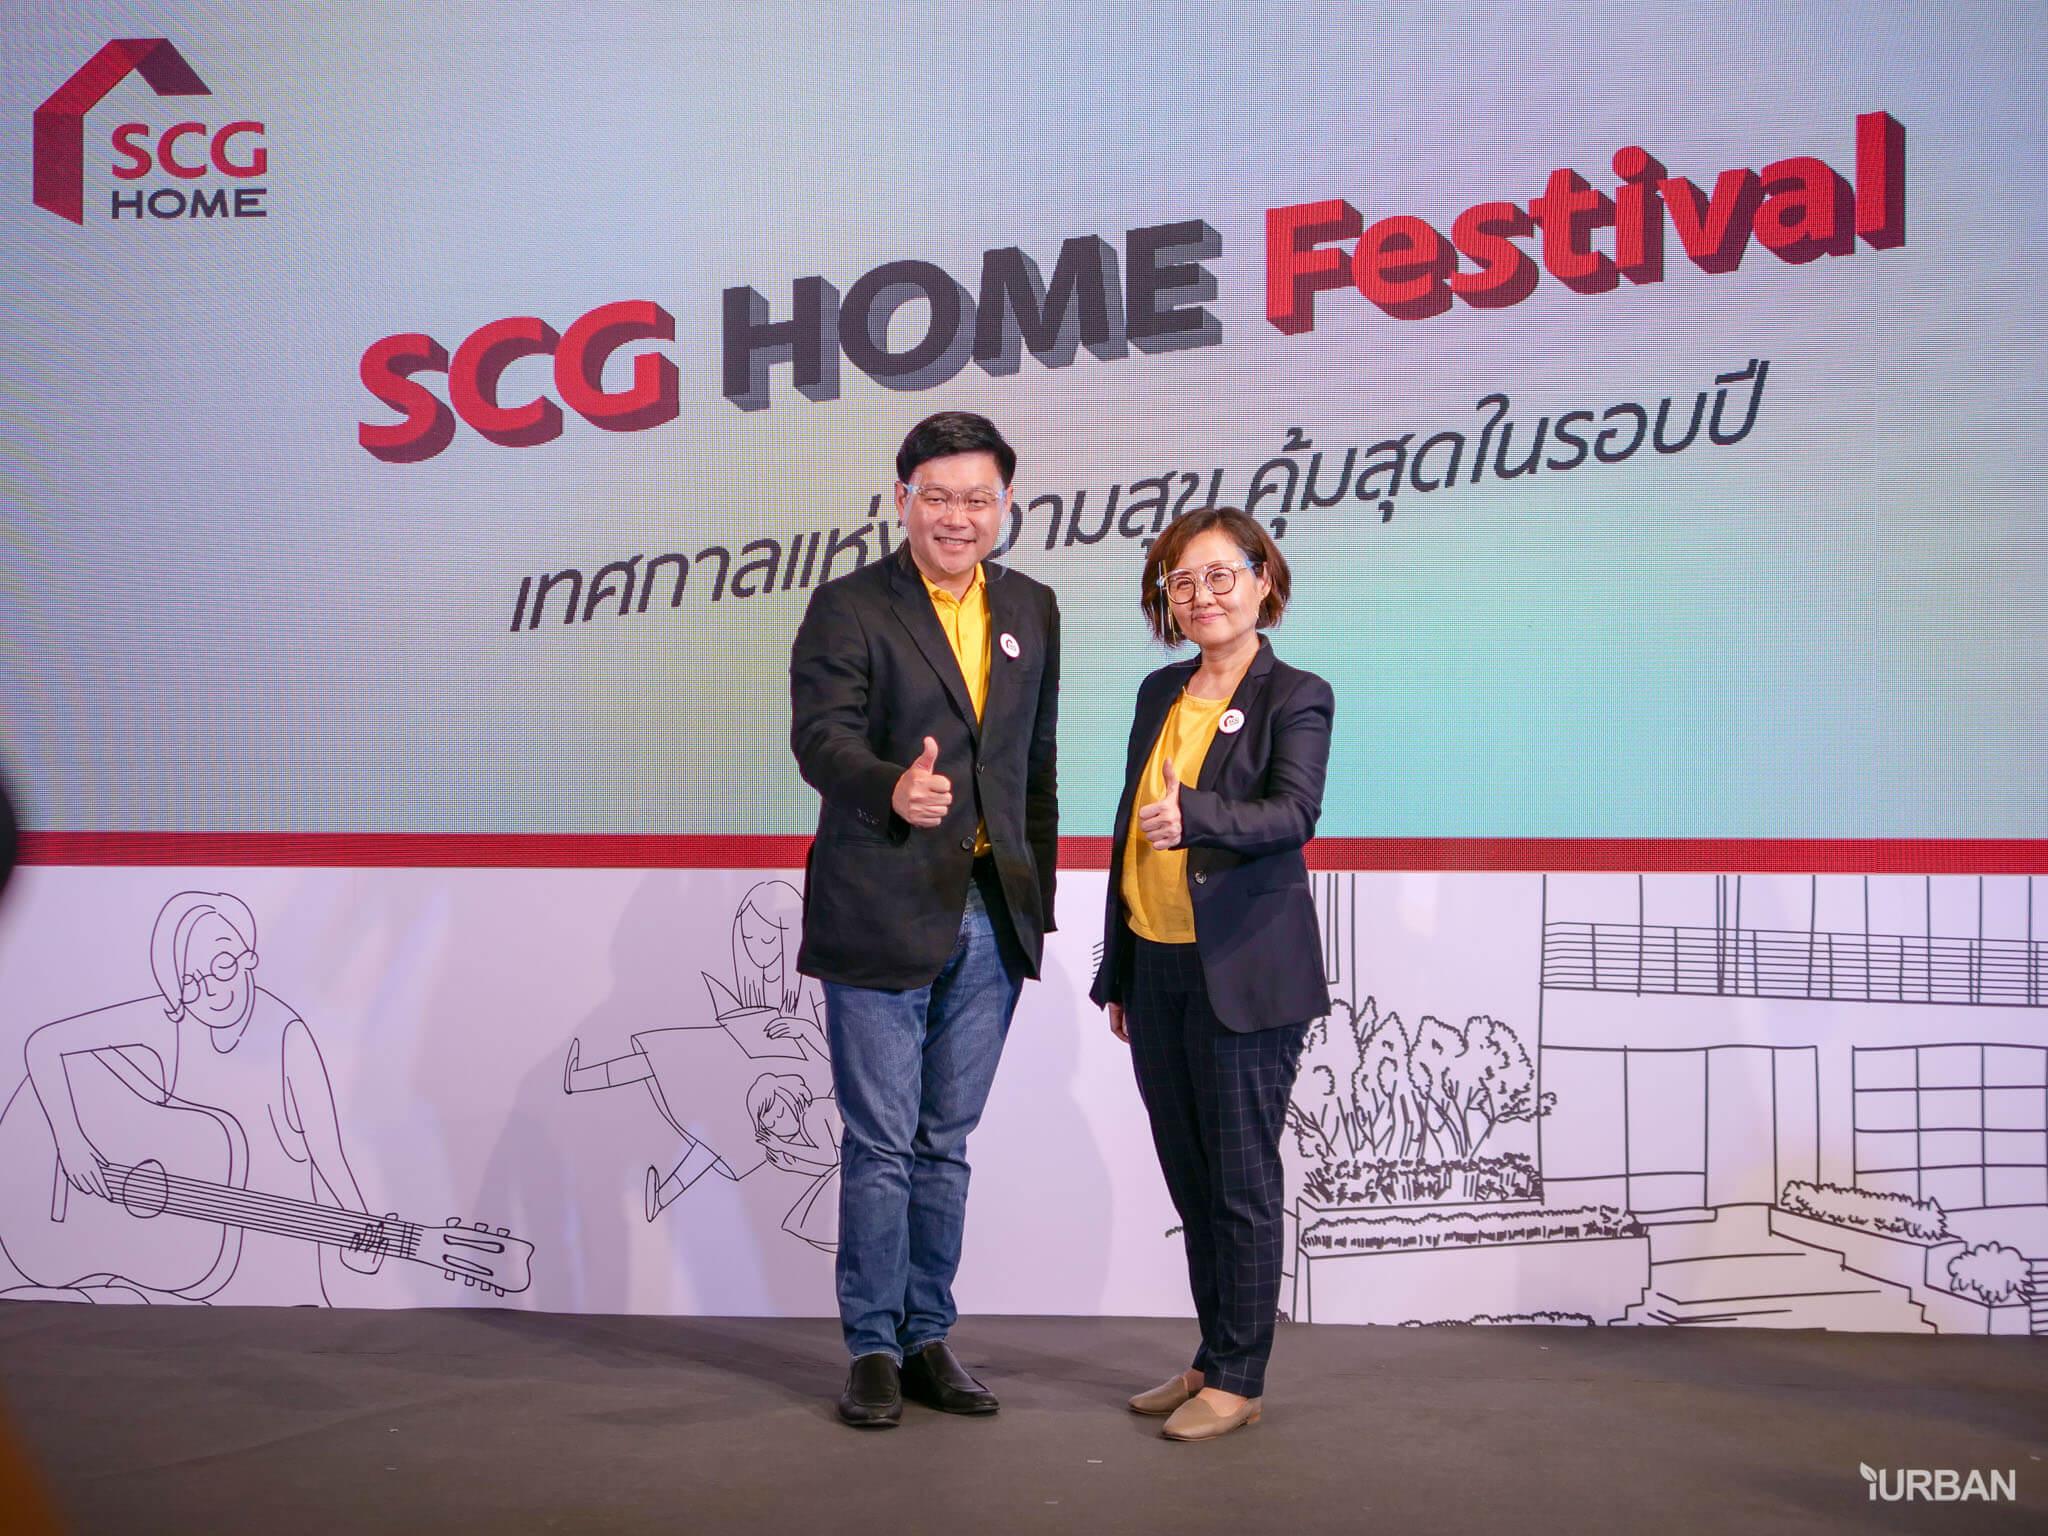 SCG HOME Festival เทศกาลที่คนรักบ้านต้องไป อย่าพลาดดูงานนี้ก่อนแต่งบ้าน @ CDC 18 - event